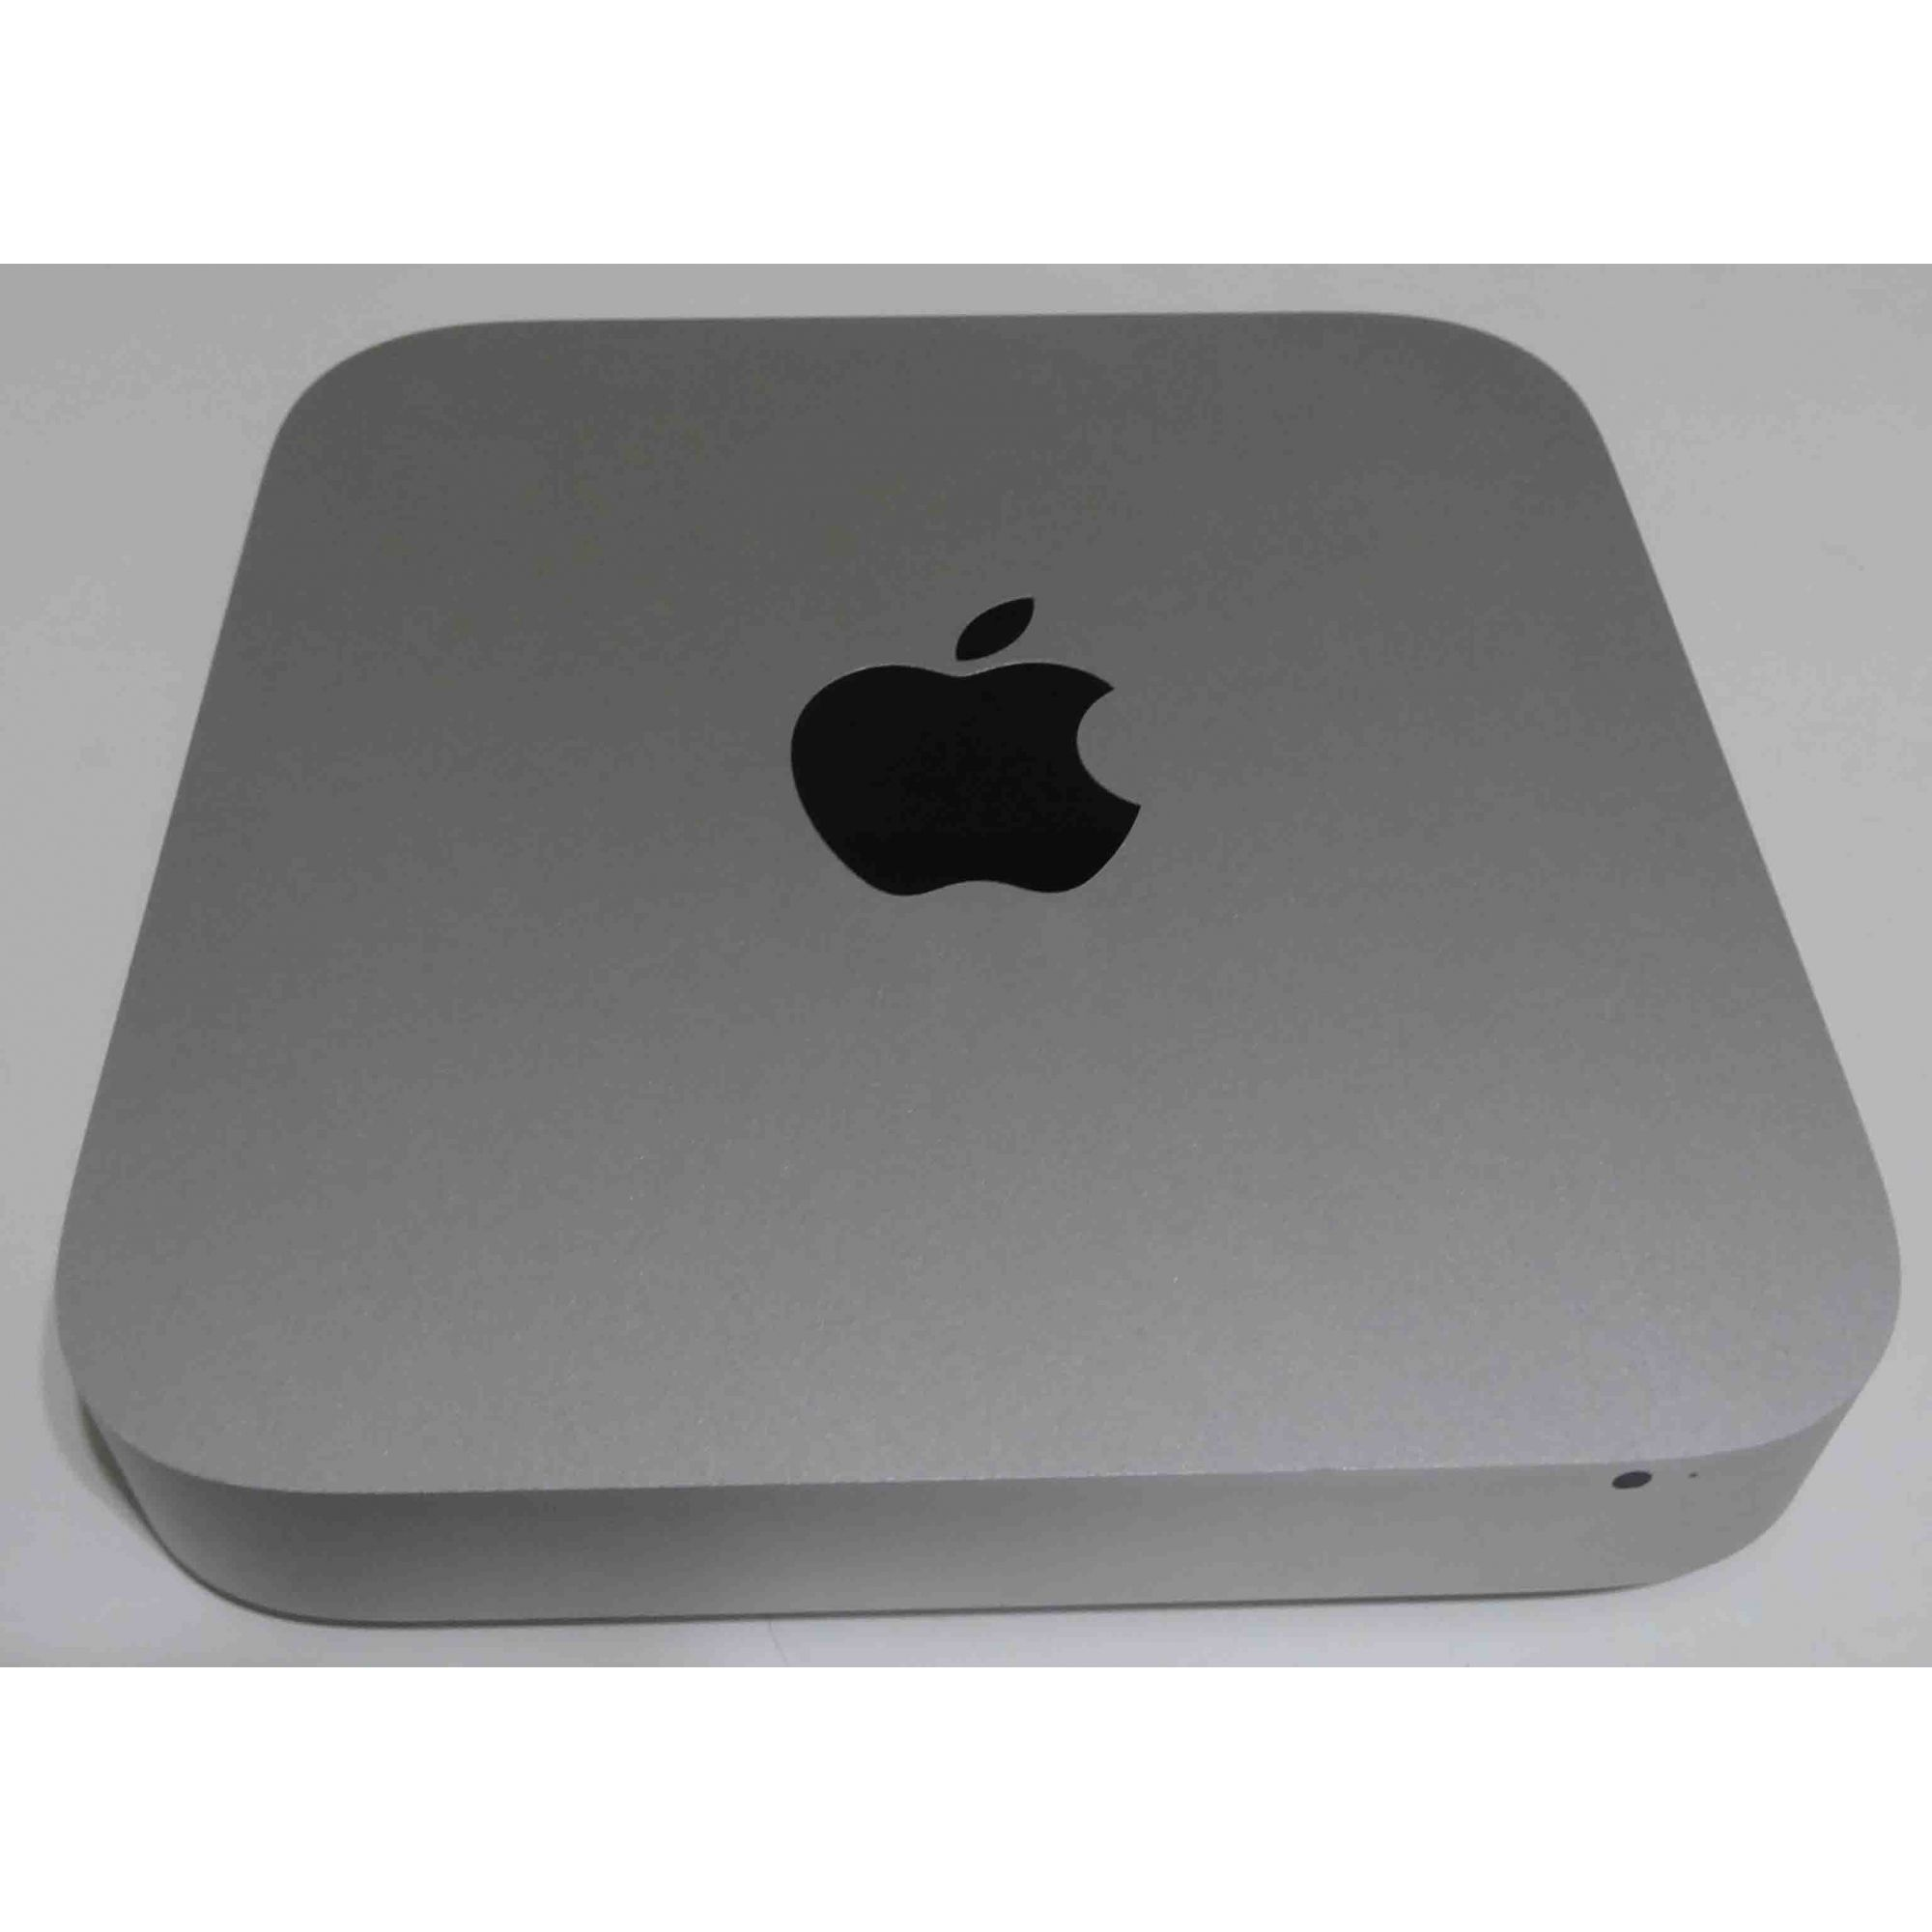 Mac mini MD387LL/A Core i5 2.5GHz 4GB HD-500GB (Não Enviamos)